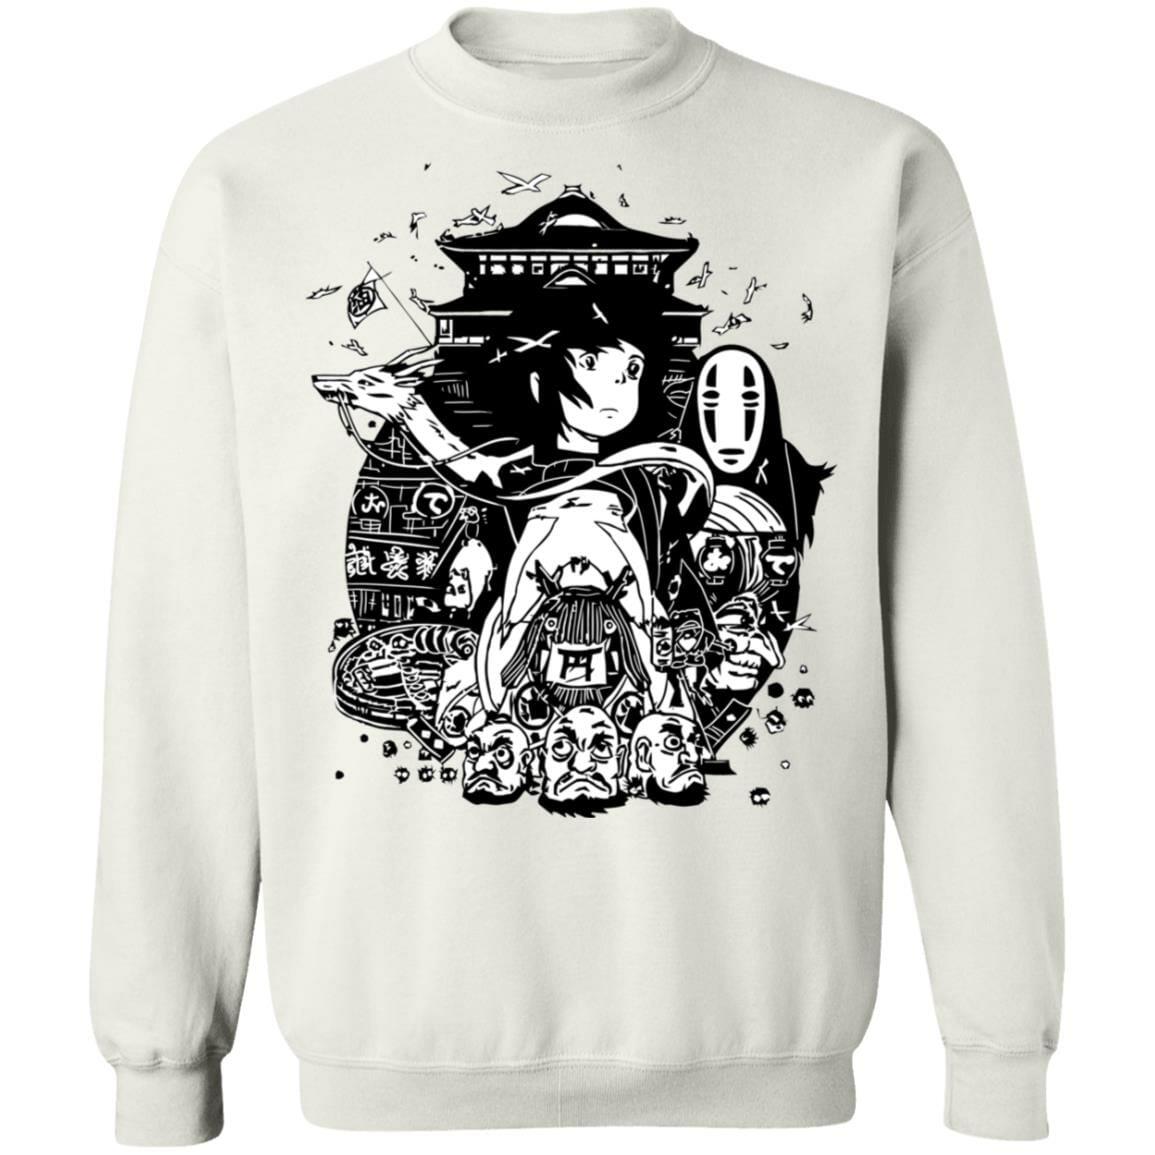 Spirited Away Art Collection Sweatshirt Unisex